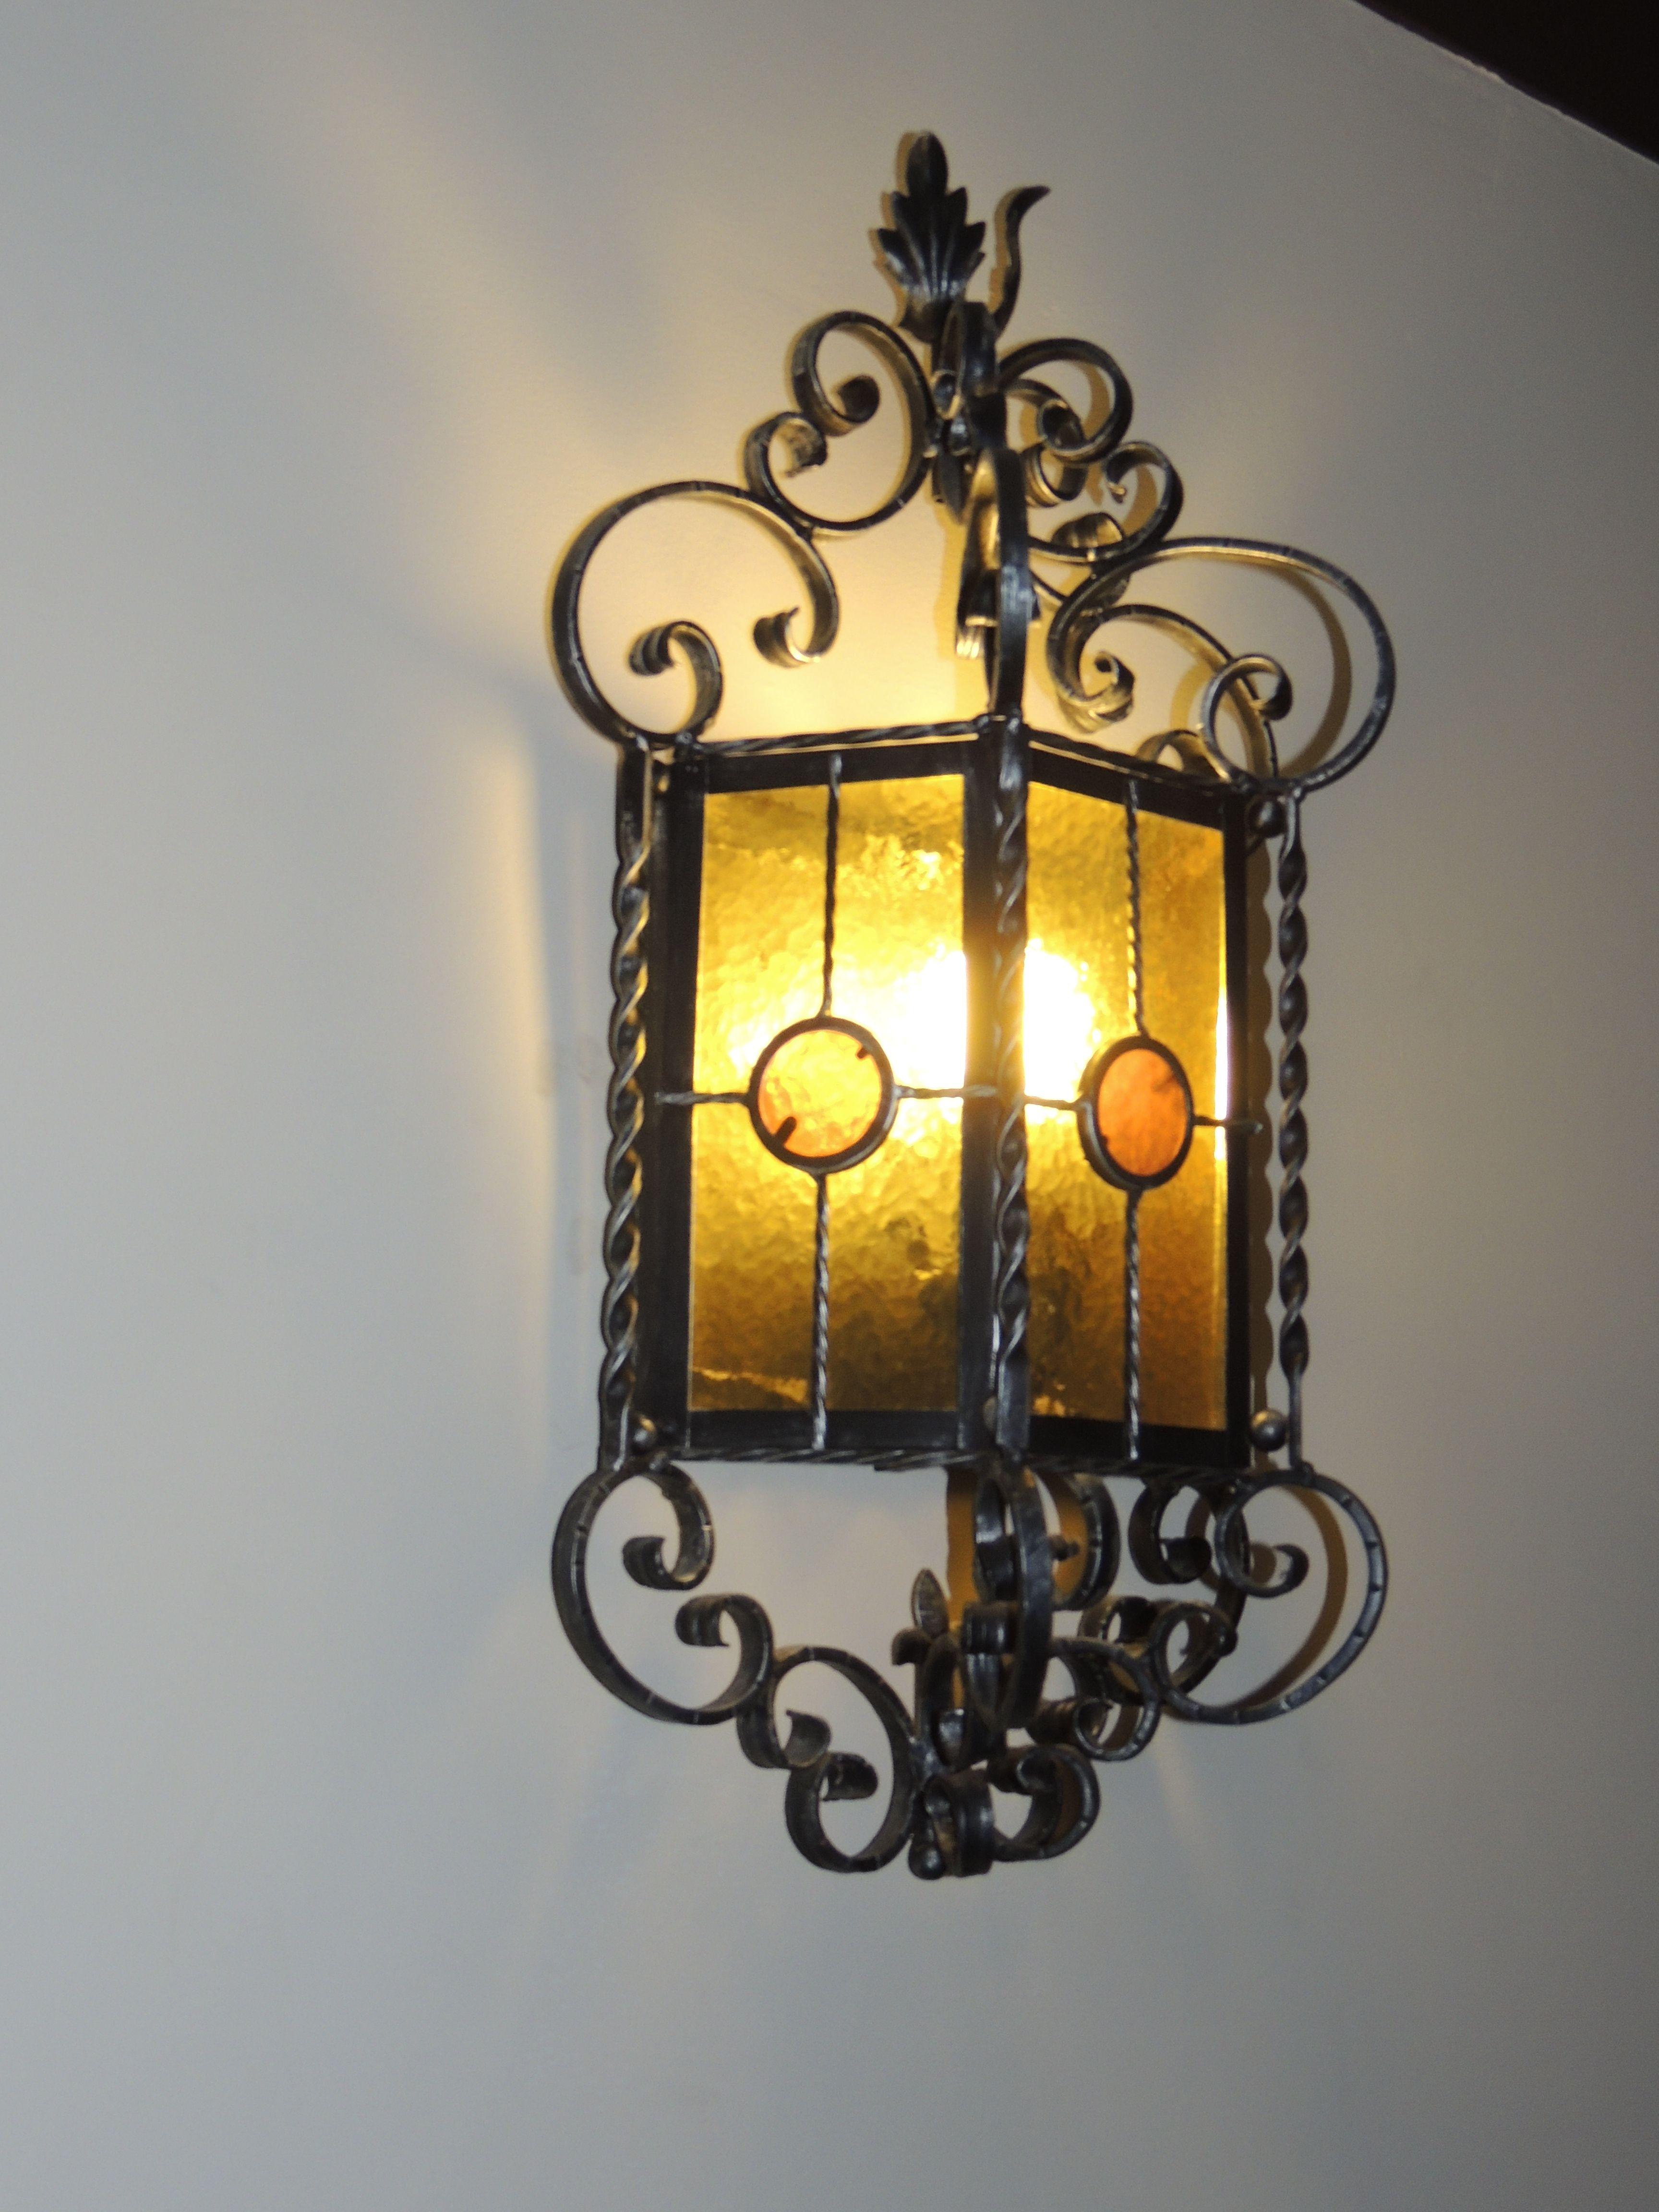 Spanish revival light fixture.